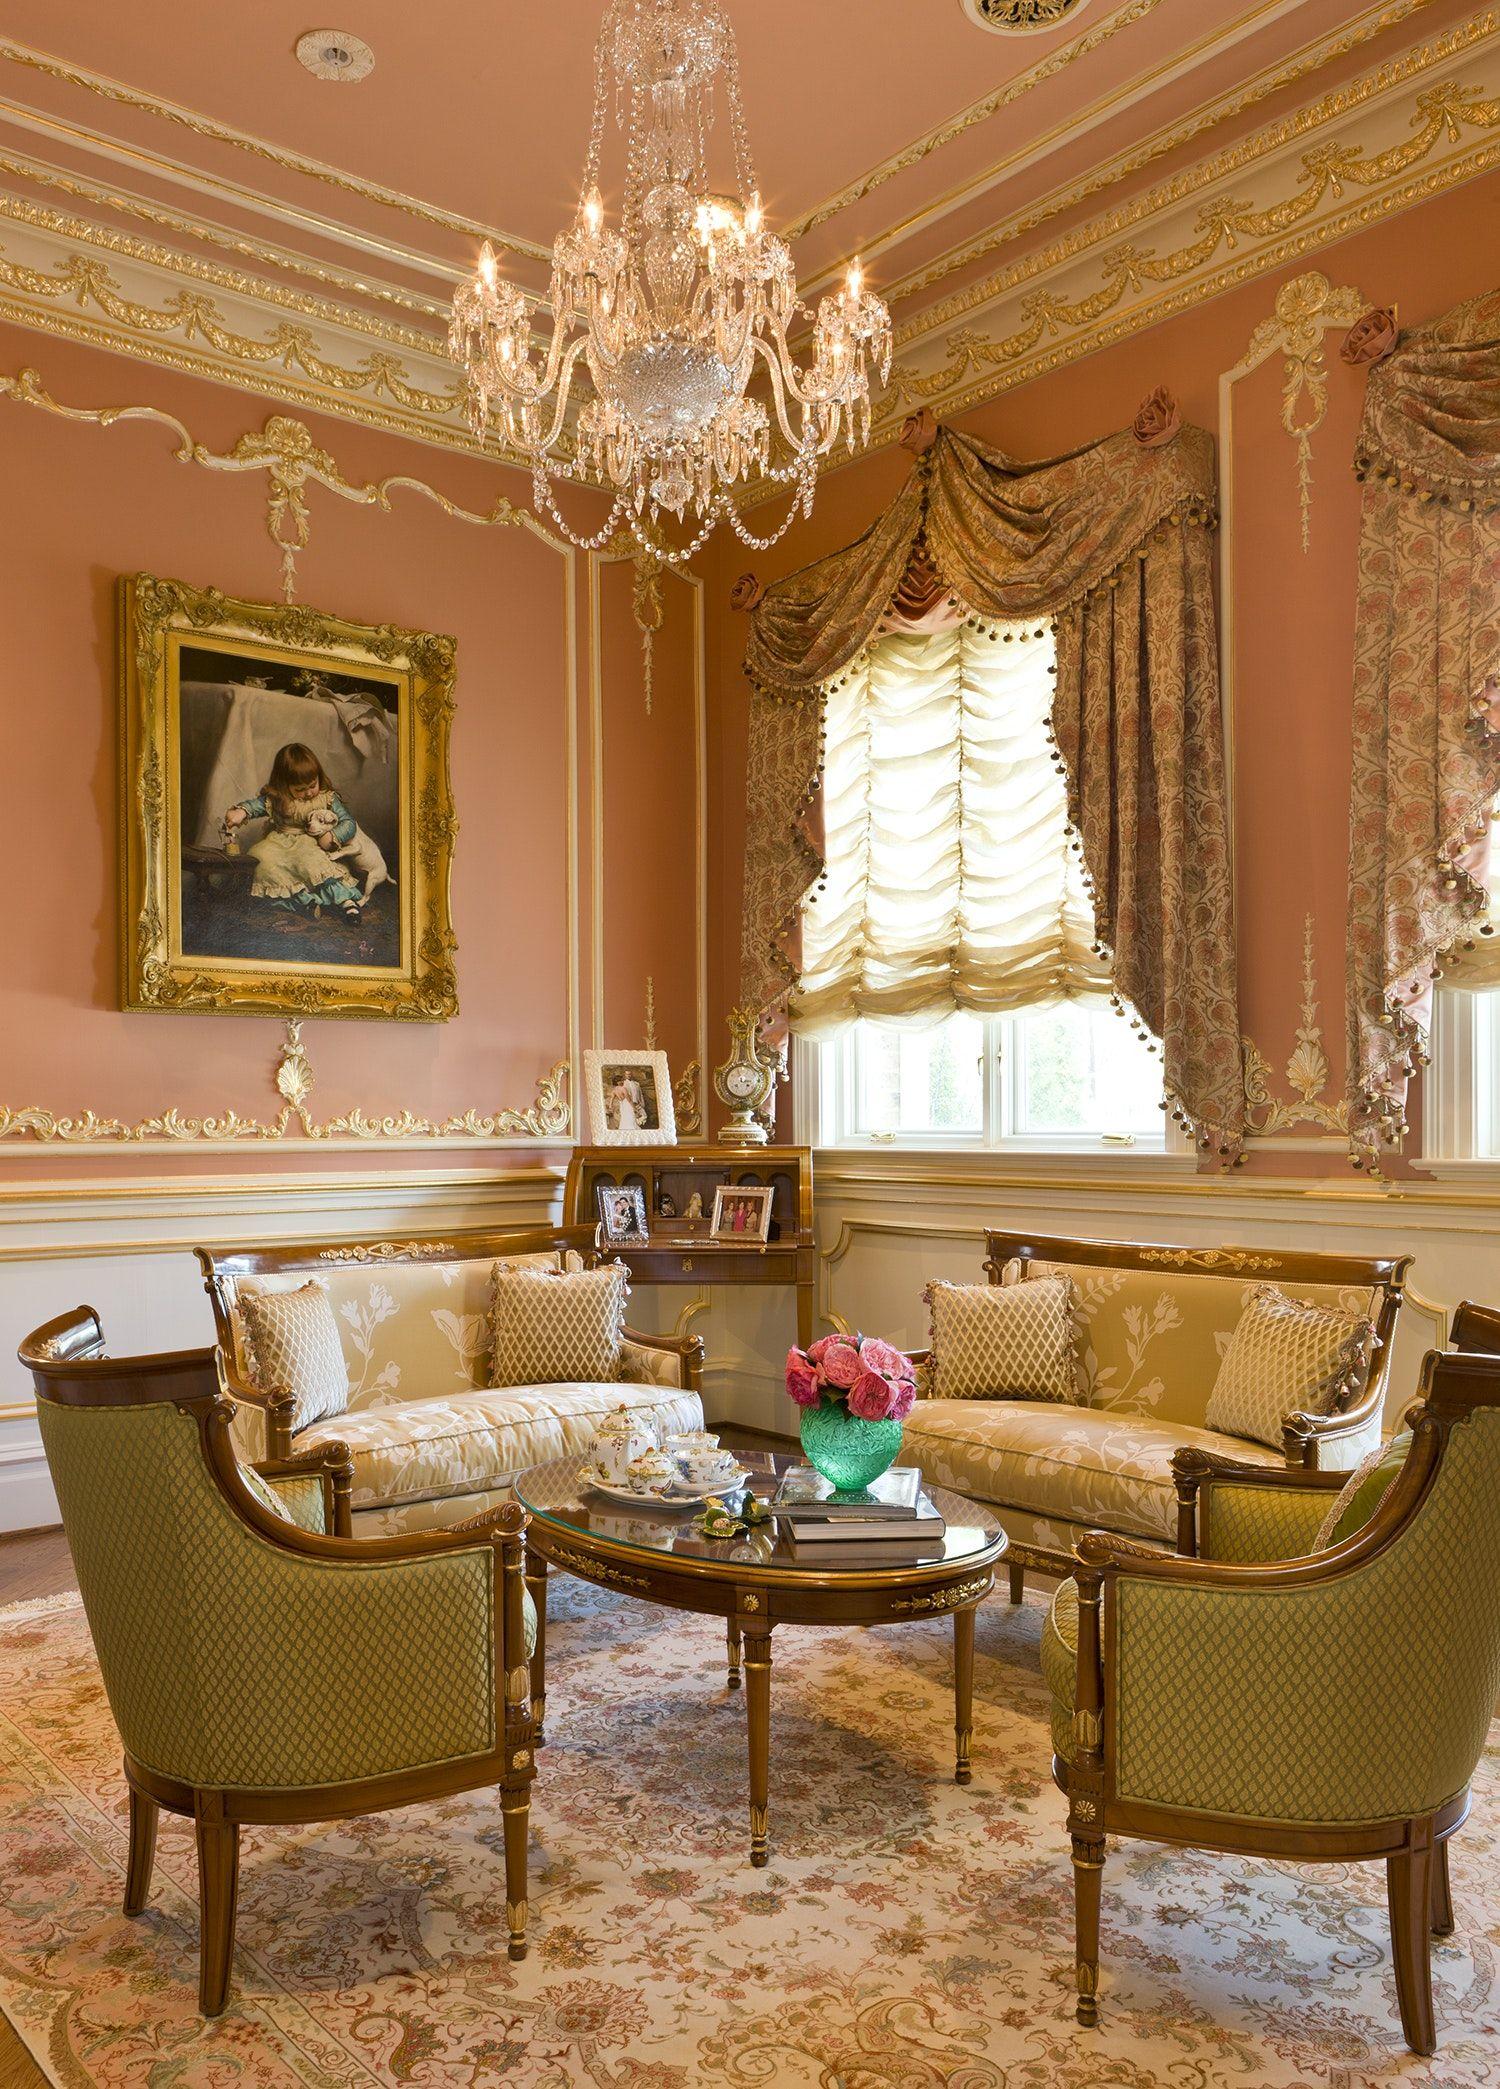 Pin By Melina Carvalho On Quartito Victorian Living Room Victorian Living Room Decor Luxury Living Room